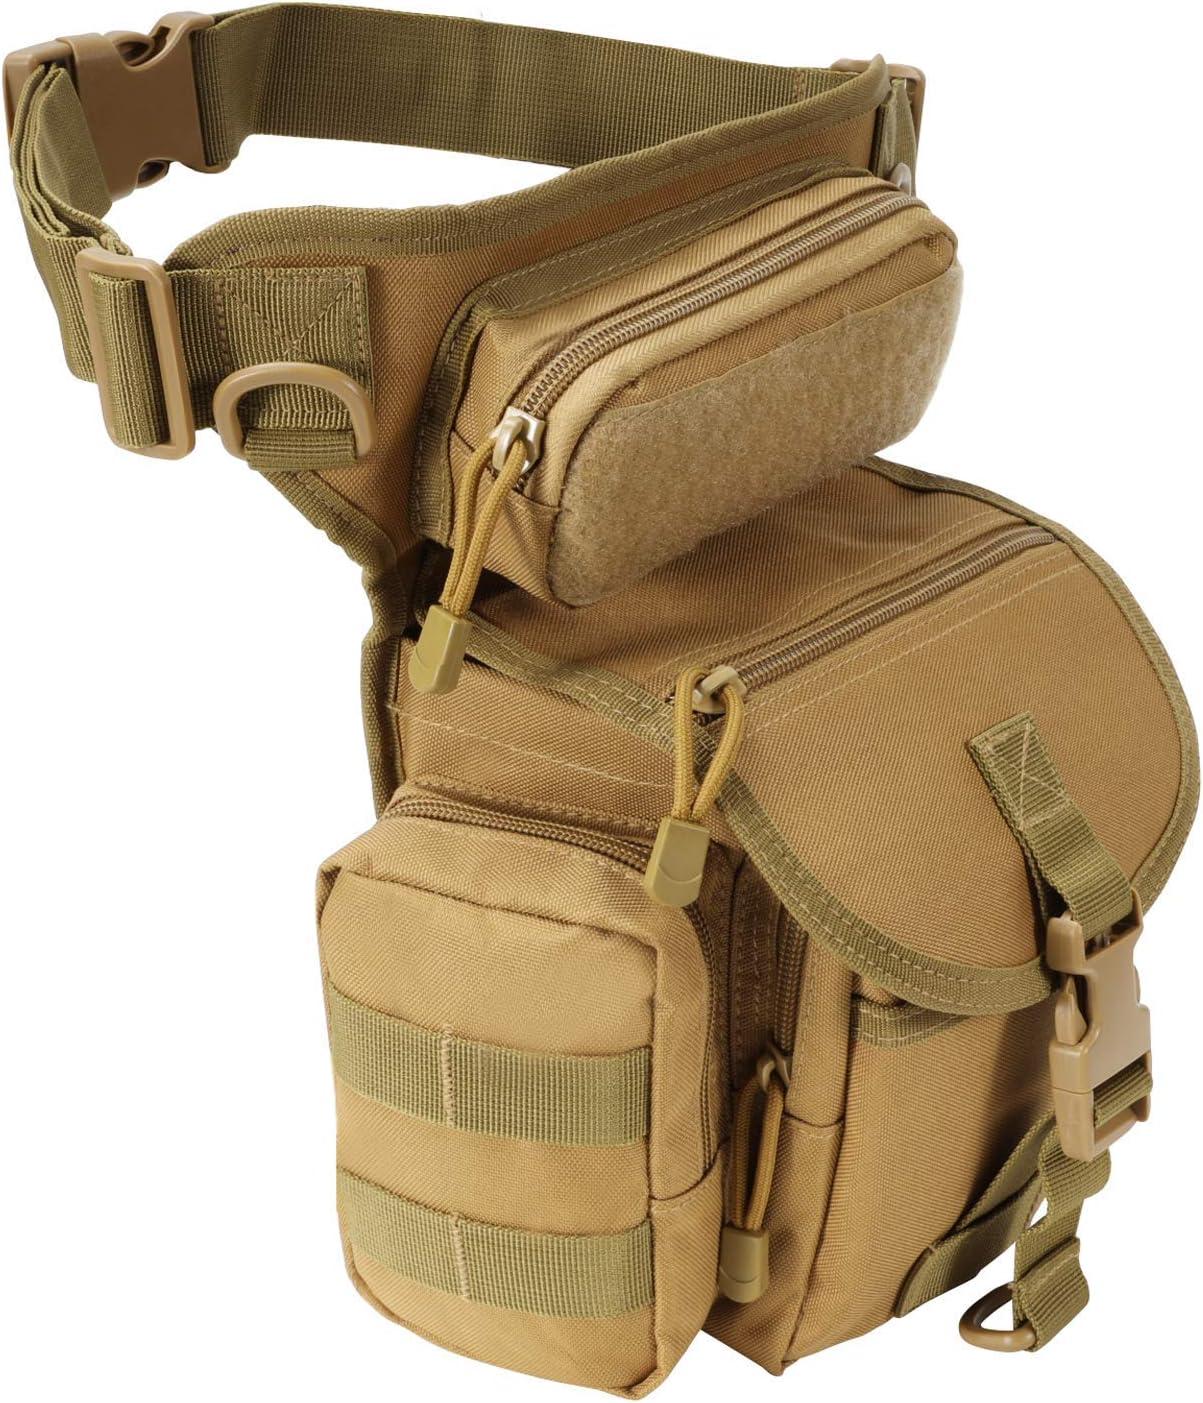 Jueachy Drop Leg Bag Mesa Mall for Max 51% OFF Men Tactica Pack Anti-Shock Molle Waist